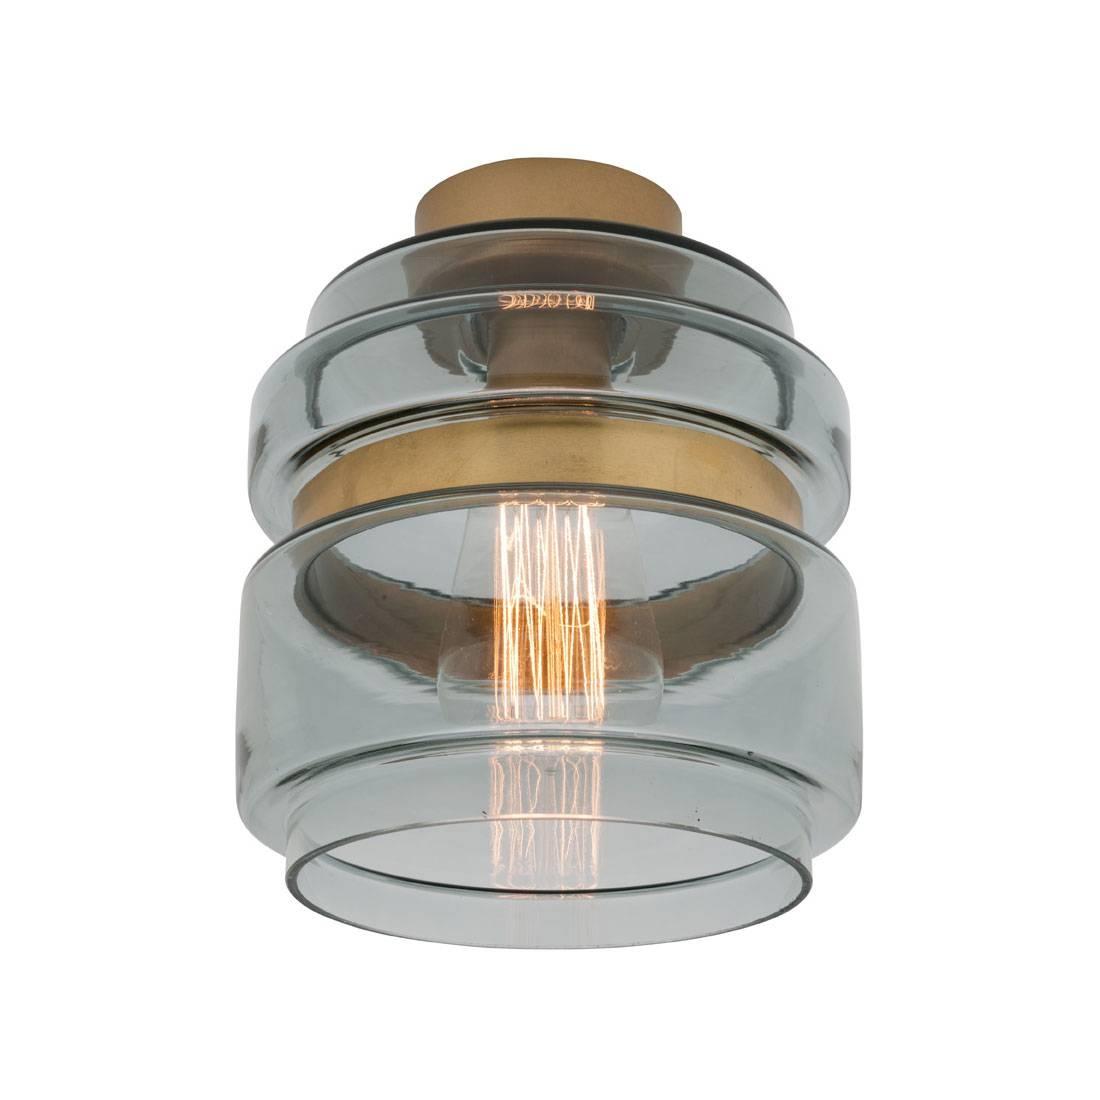 Phoebe Diy Batten Fix Shade - Mm5871 | Online Lighting with Batten Fix Lights Shades (Image 14 of 15)